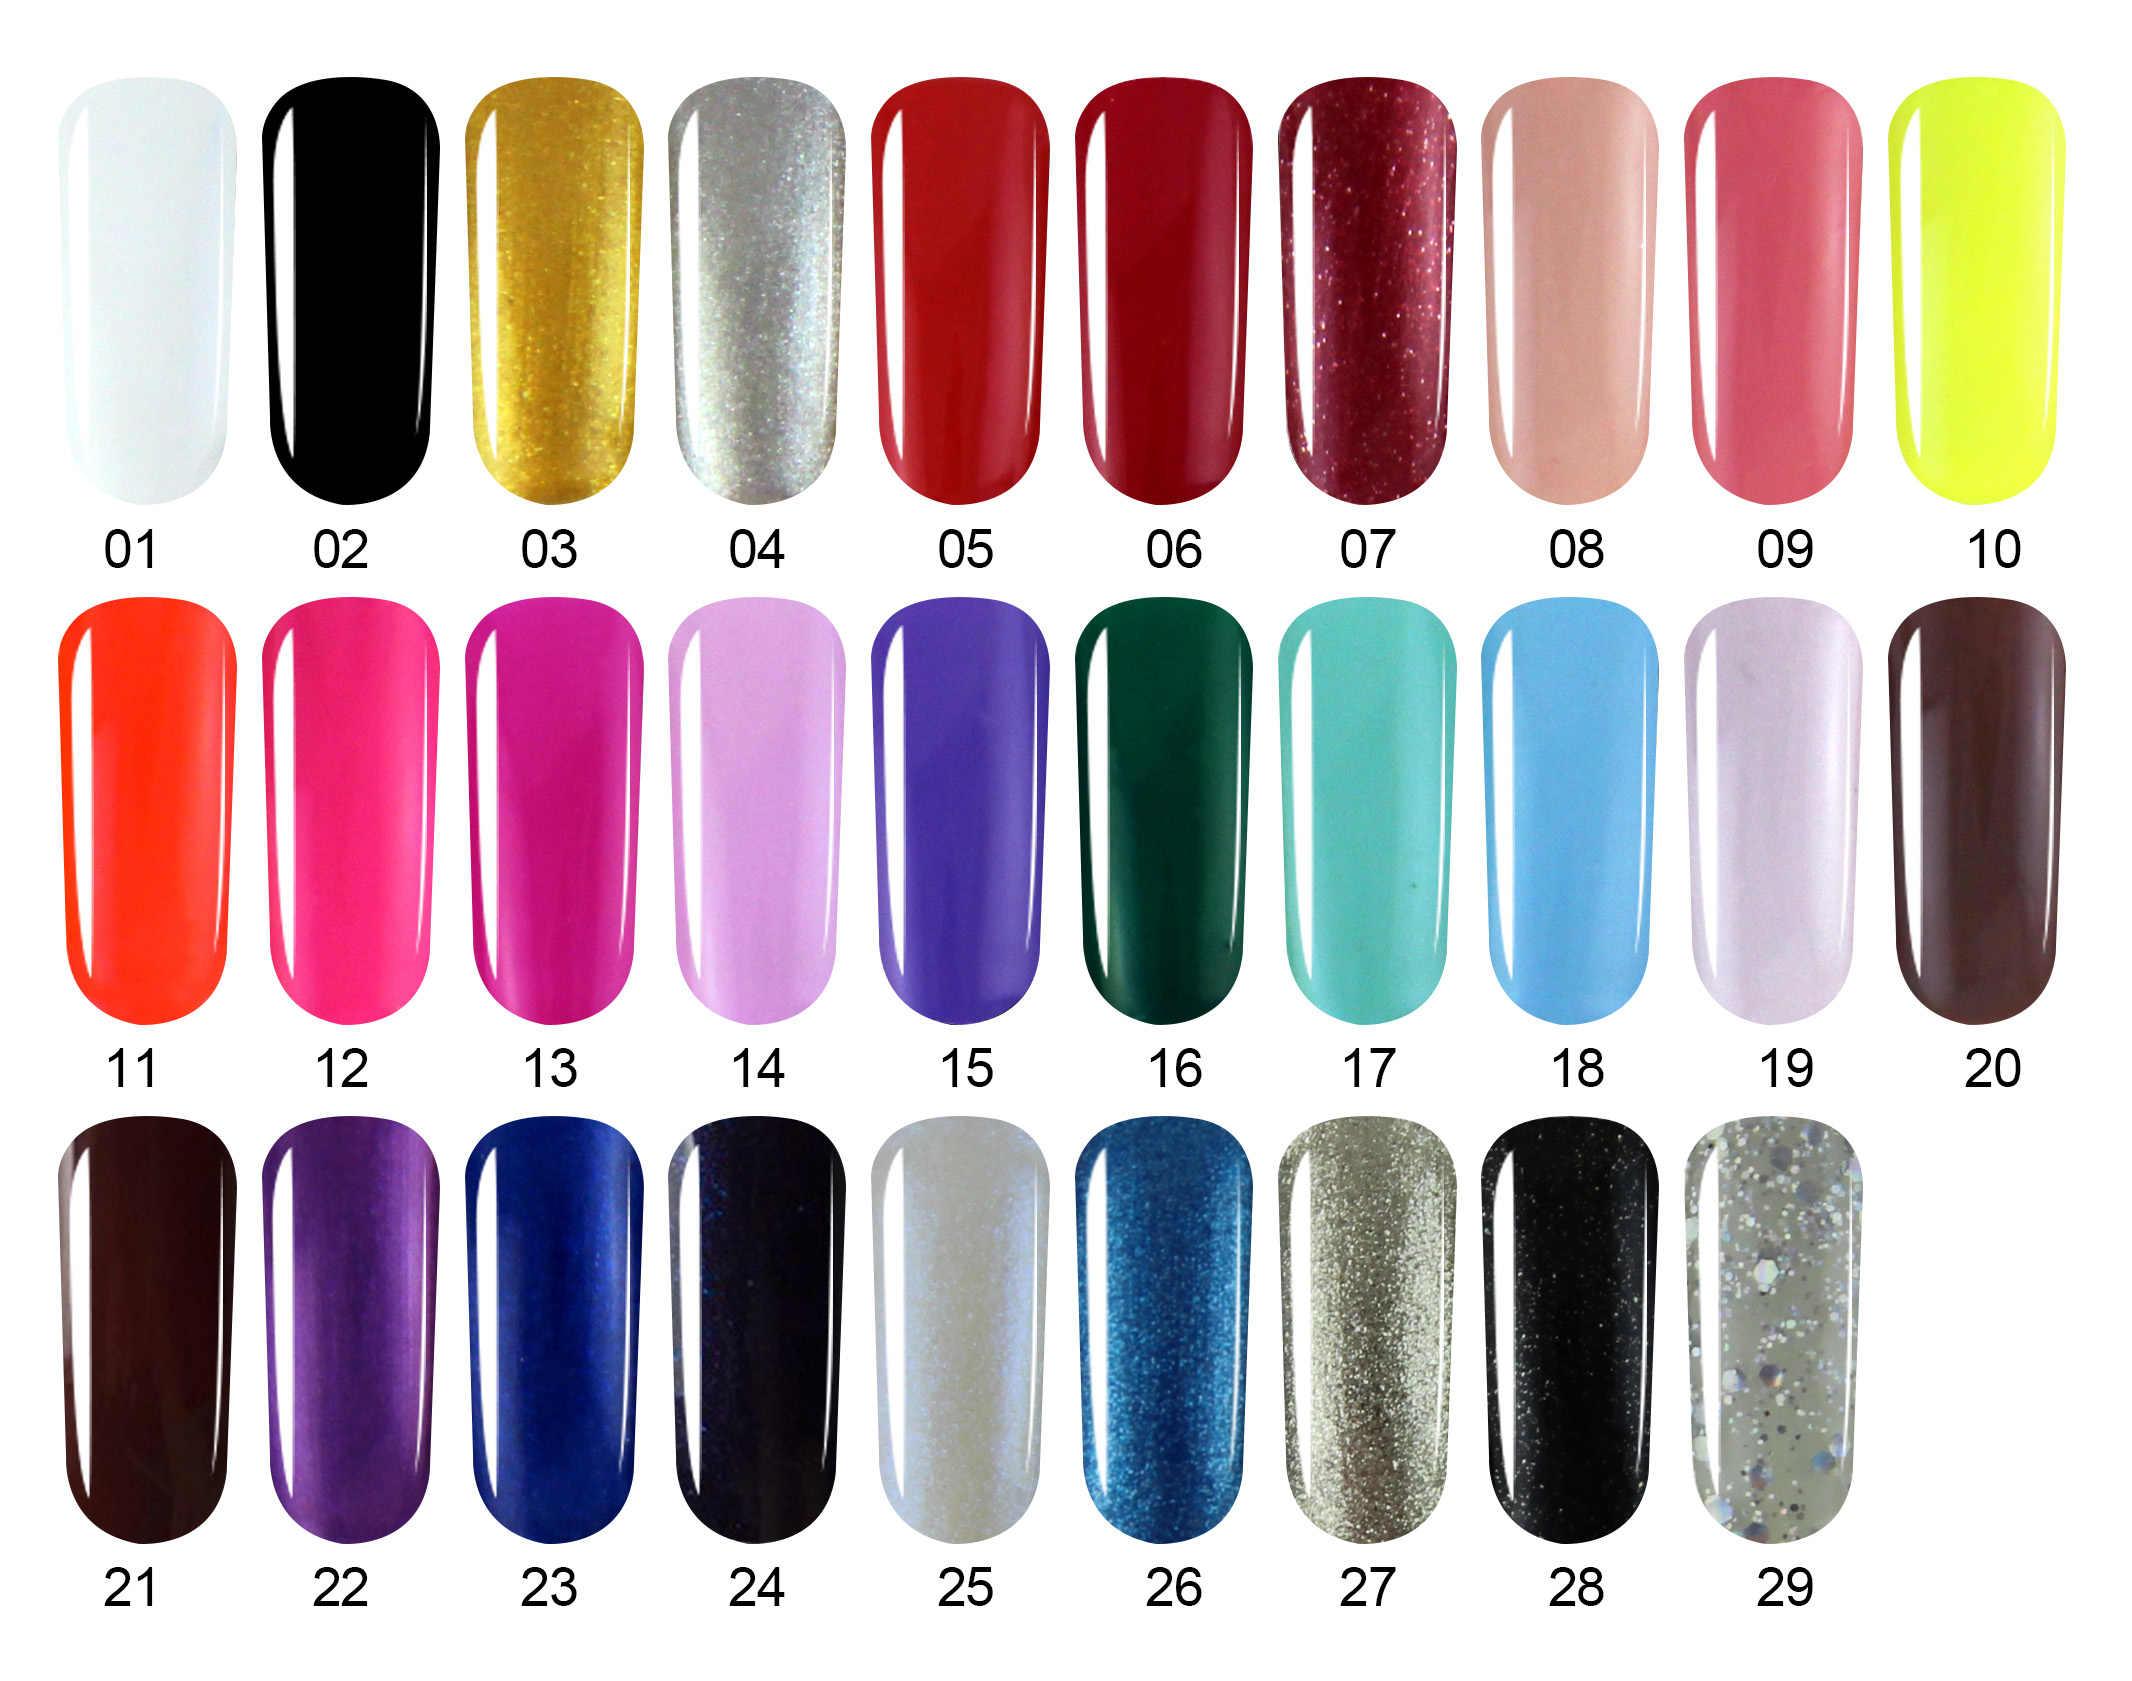 Verntion בצבע טבעי UV מסמר לכה אמנות הארכה ג 'ל פריימר לספוג Off לאורך זמן מזל נייל Polygel